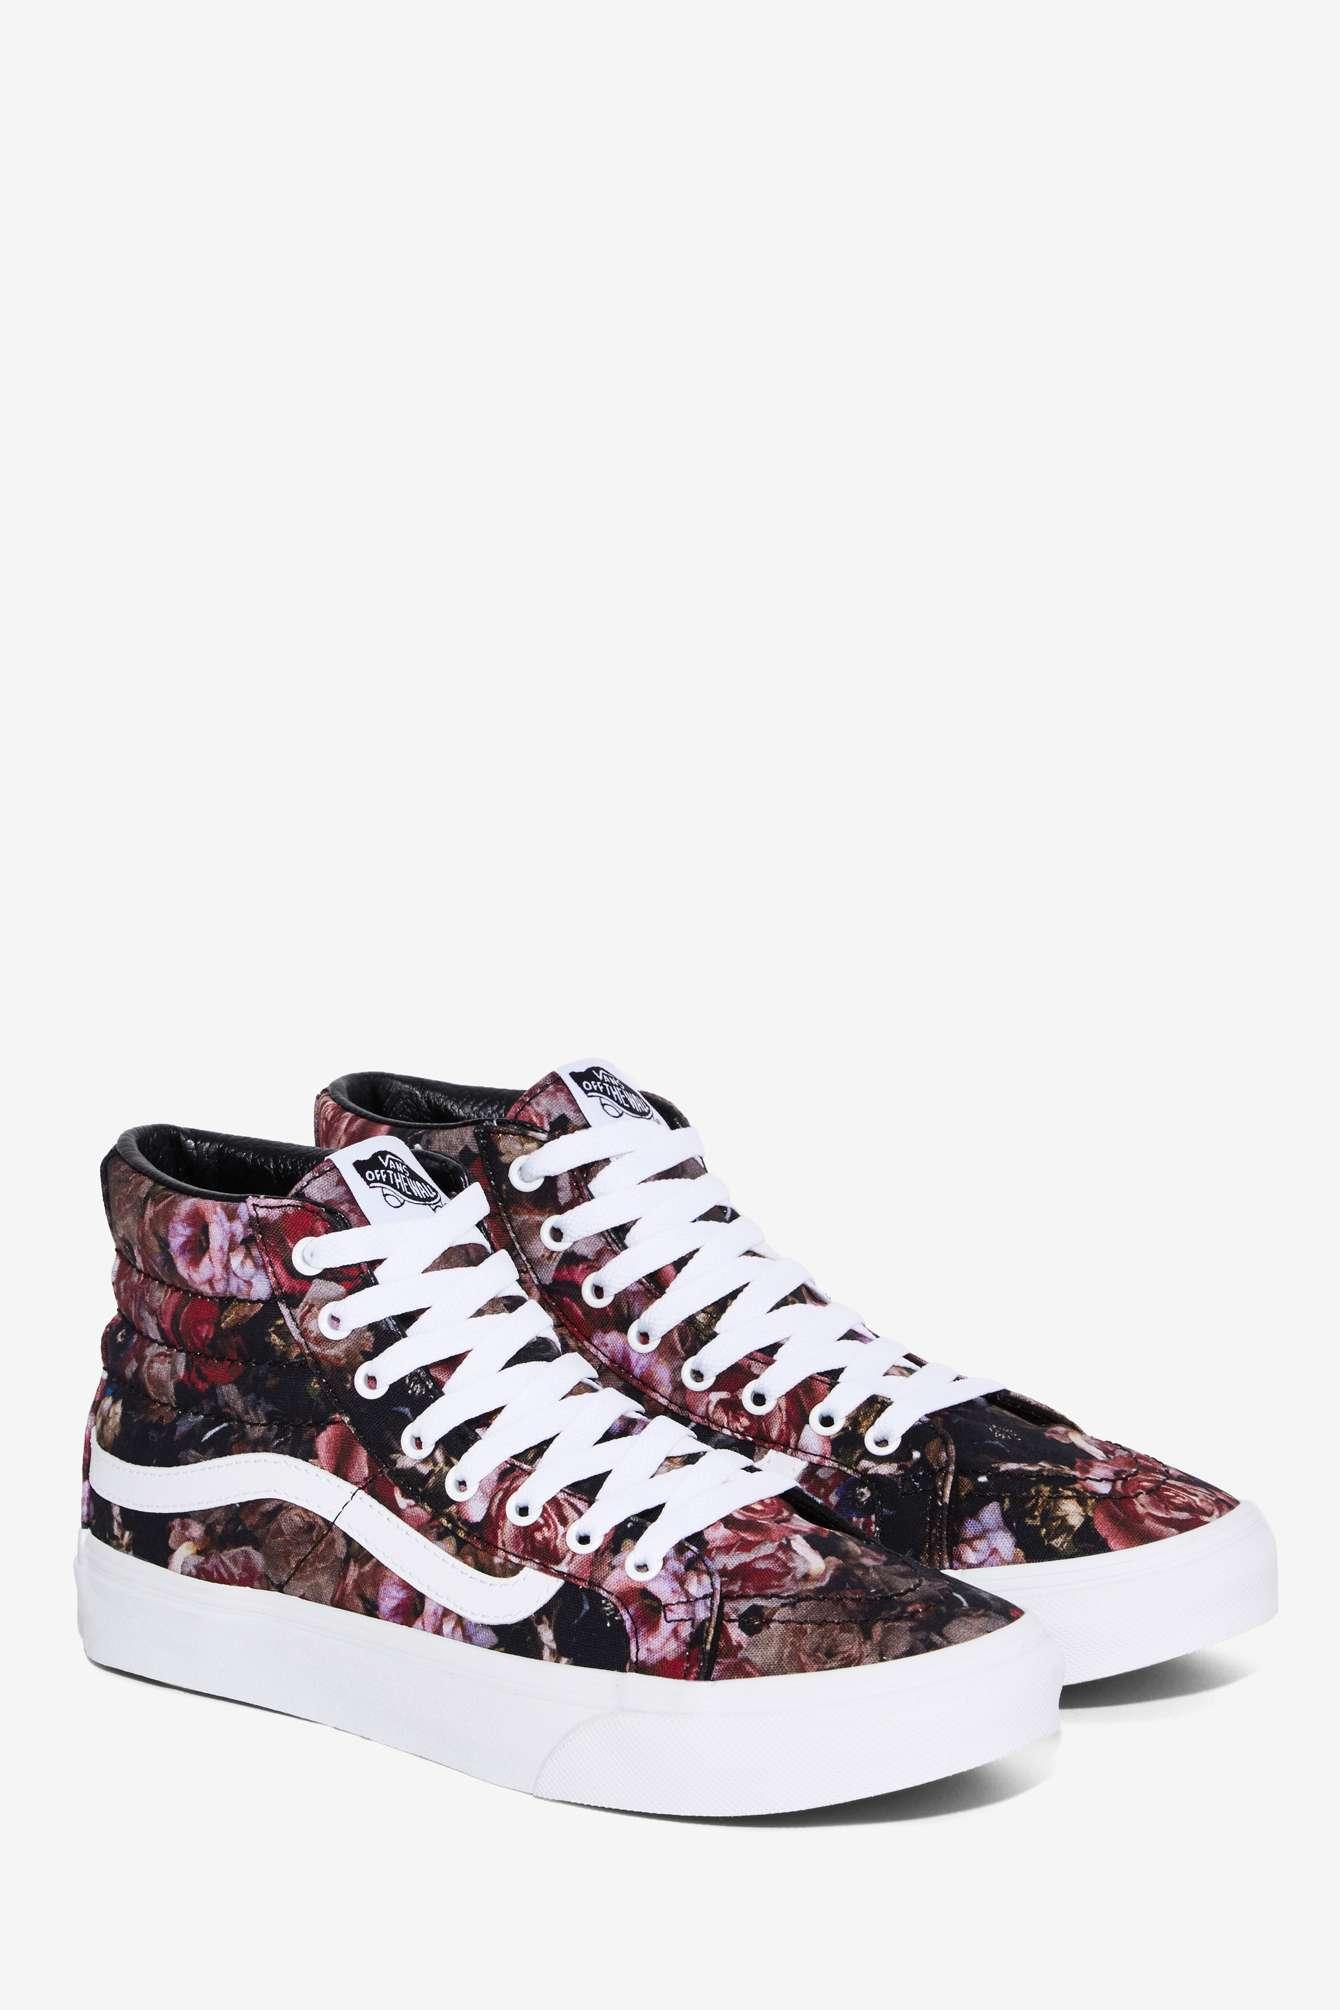 521fa6e15 أحذية رياضية في غاية الأناقة 2017   المرسال